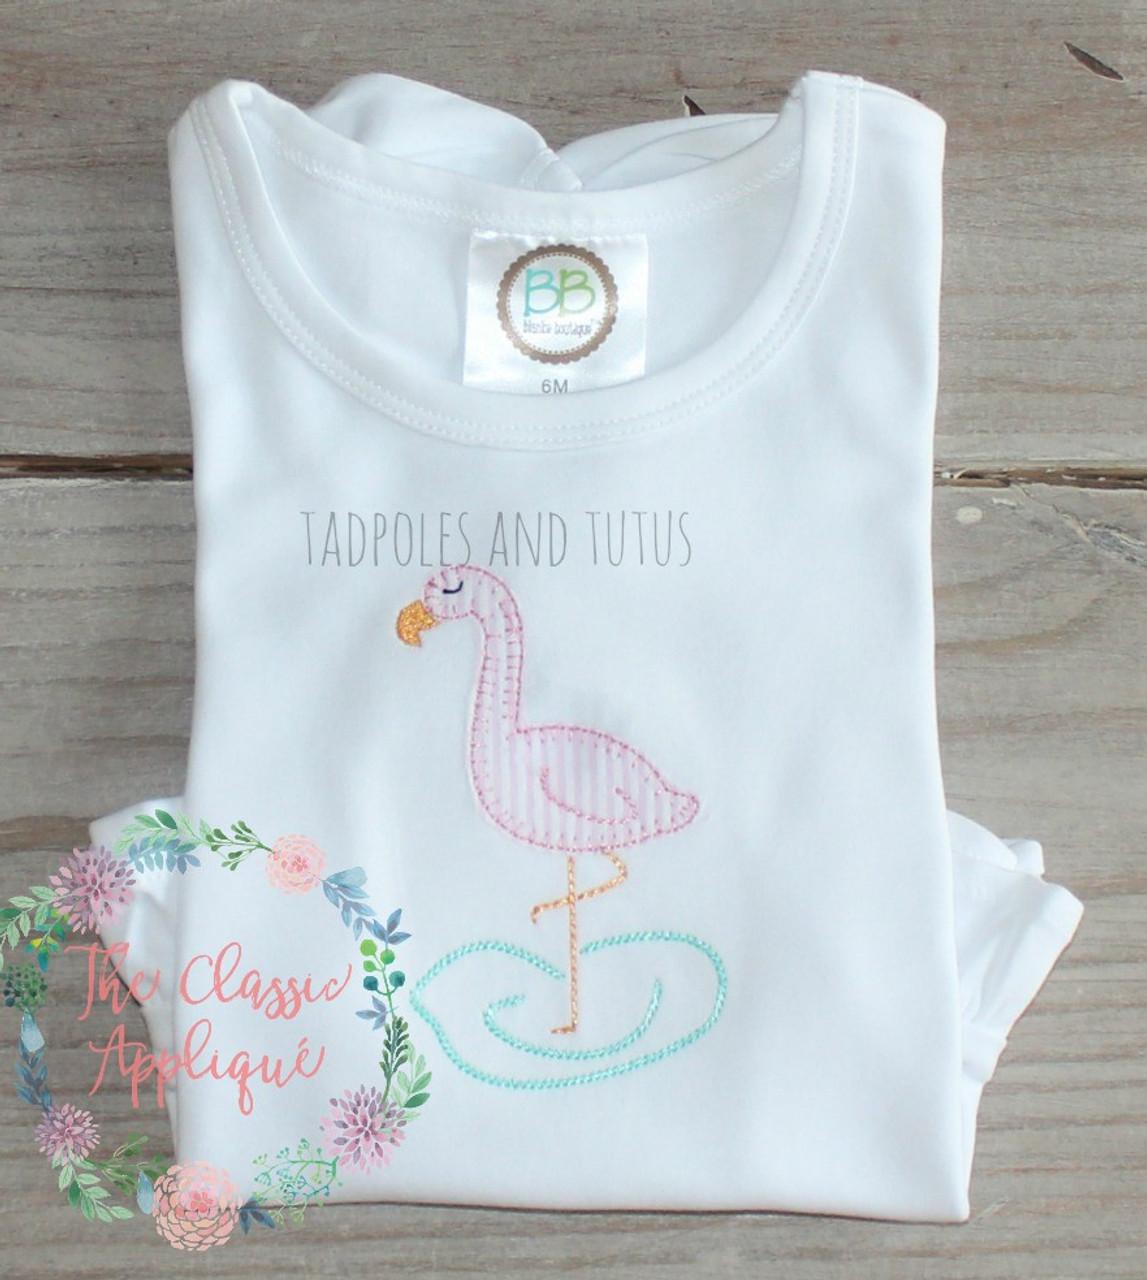 The Classic Applique Flamingo Blanket Stitch Raggy Applique Machine Embroidery Design